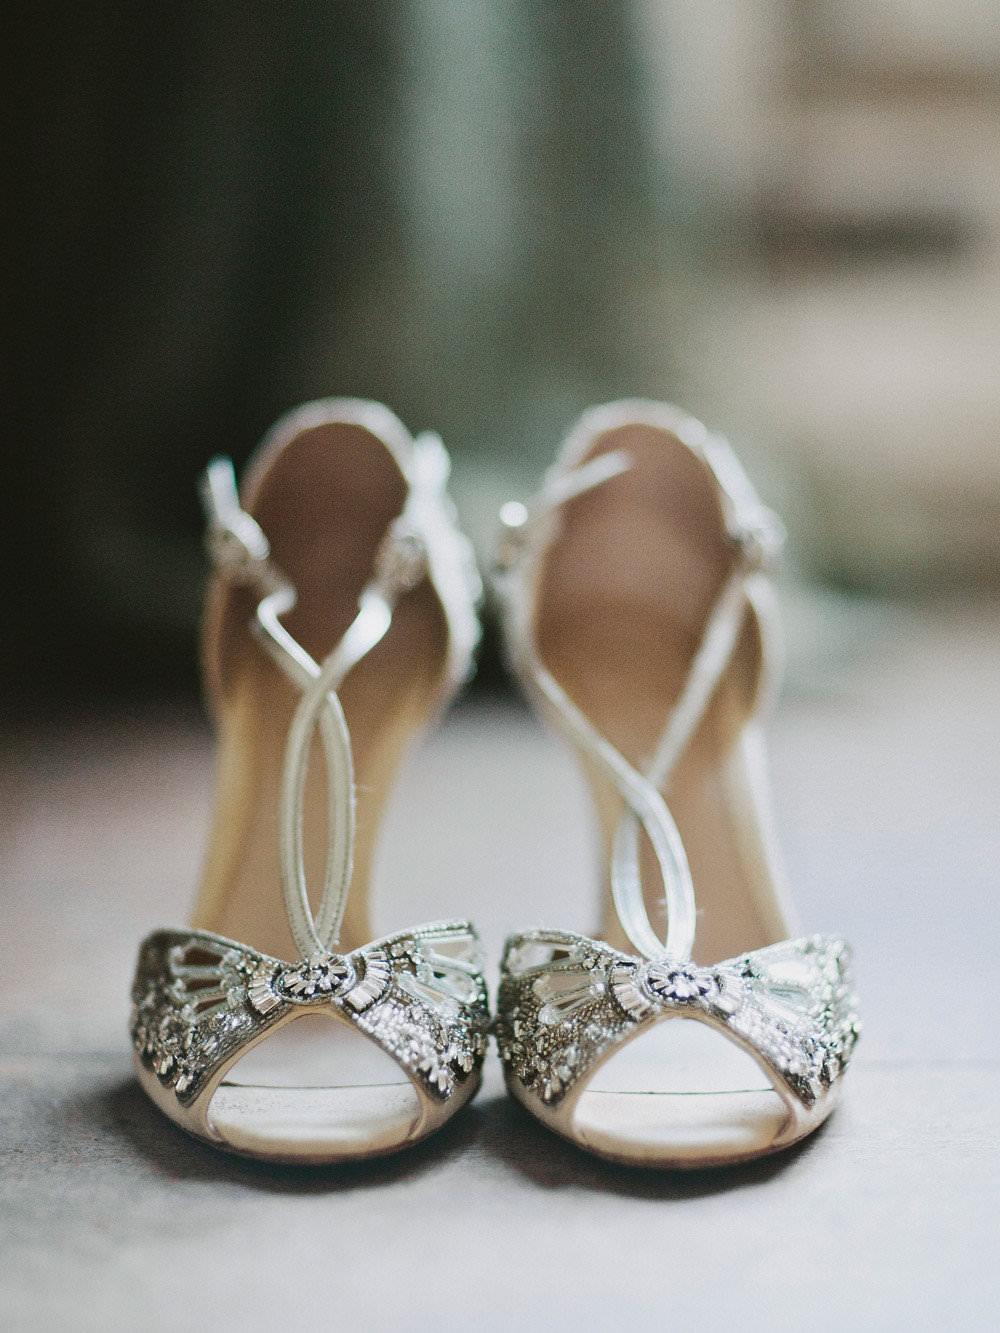 Bride Bridal 1930s T Bar Shoes Sandals Emmy London Glamorous Vintage Eggington House Wedding Ideas David Jenkins Photography